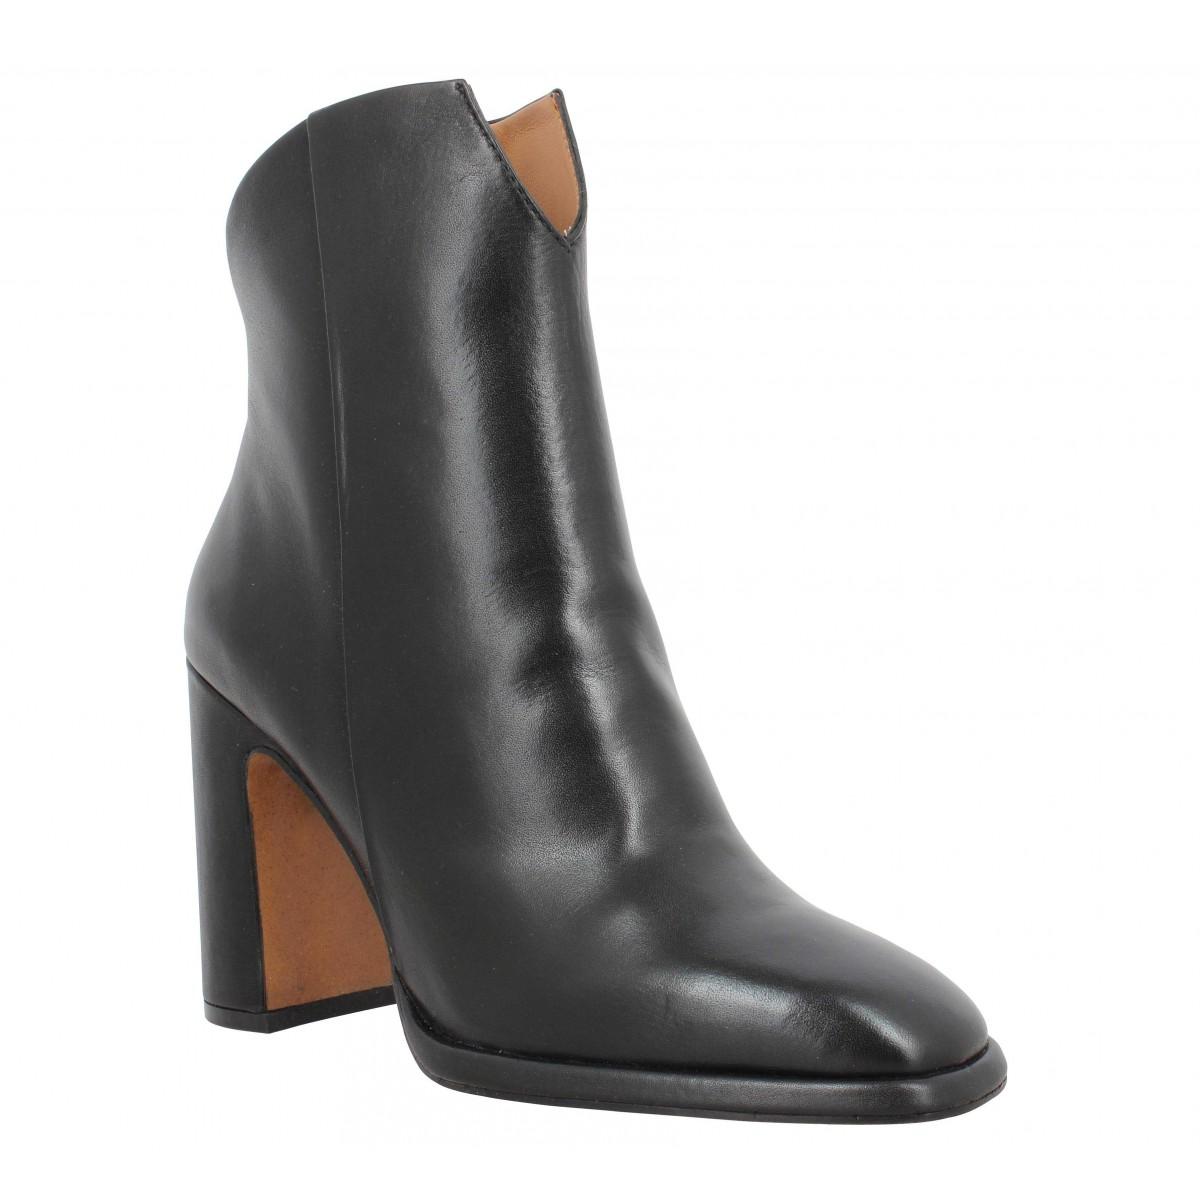 Bottines BRUNO PREMI 3301 cuir Femme Noir